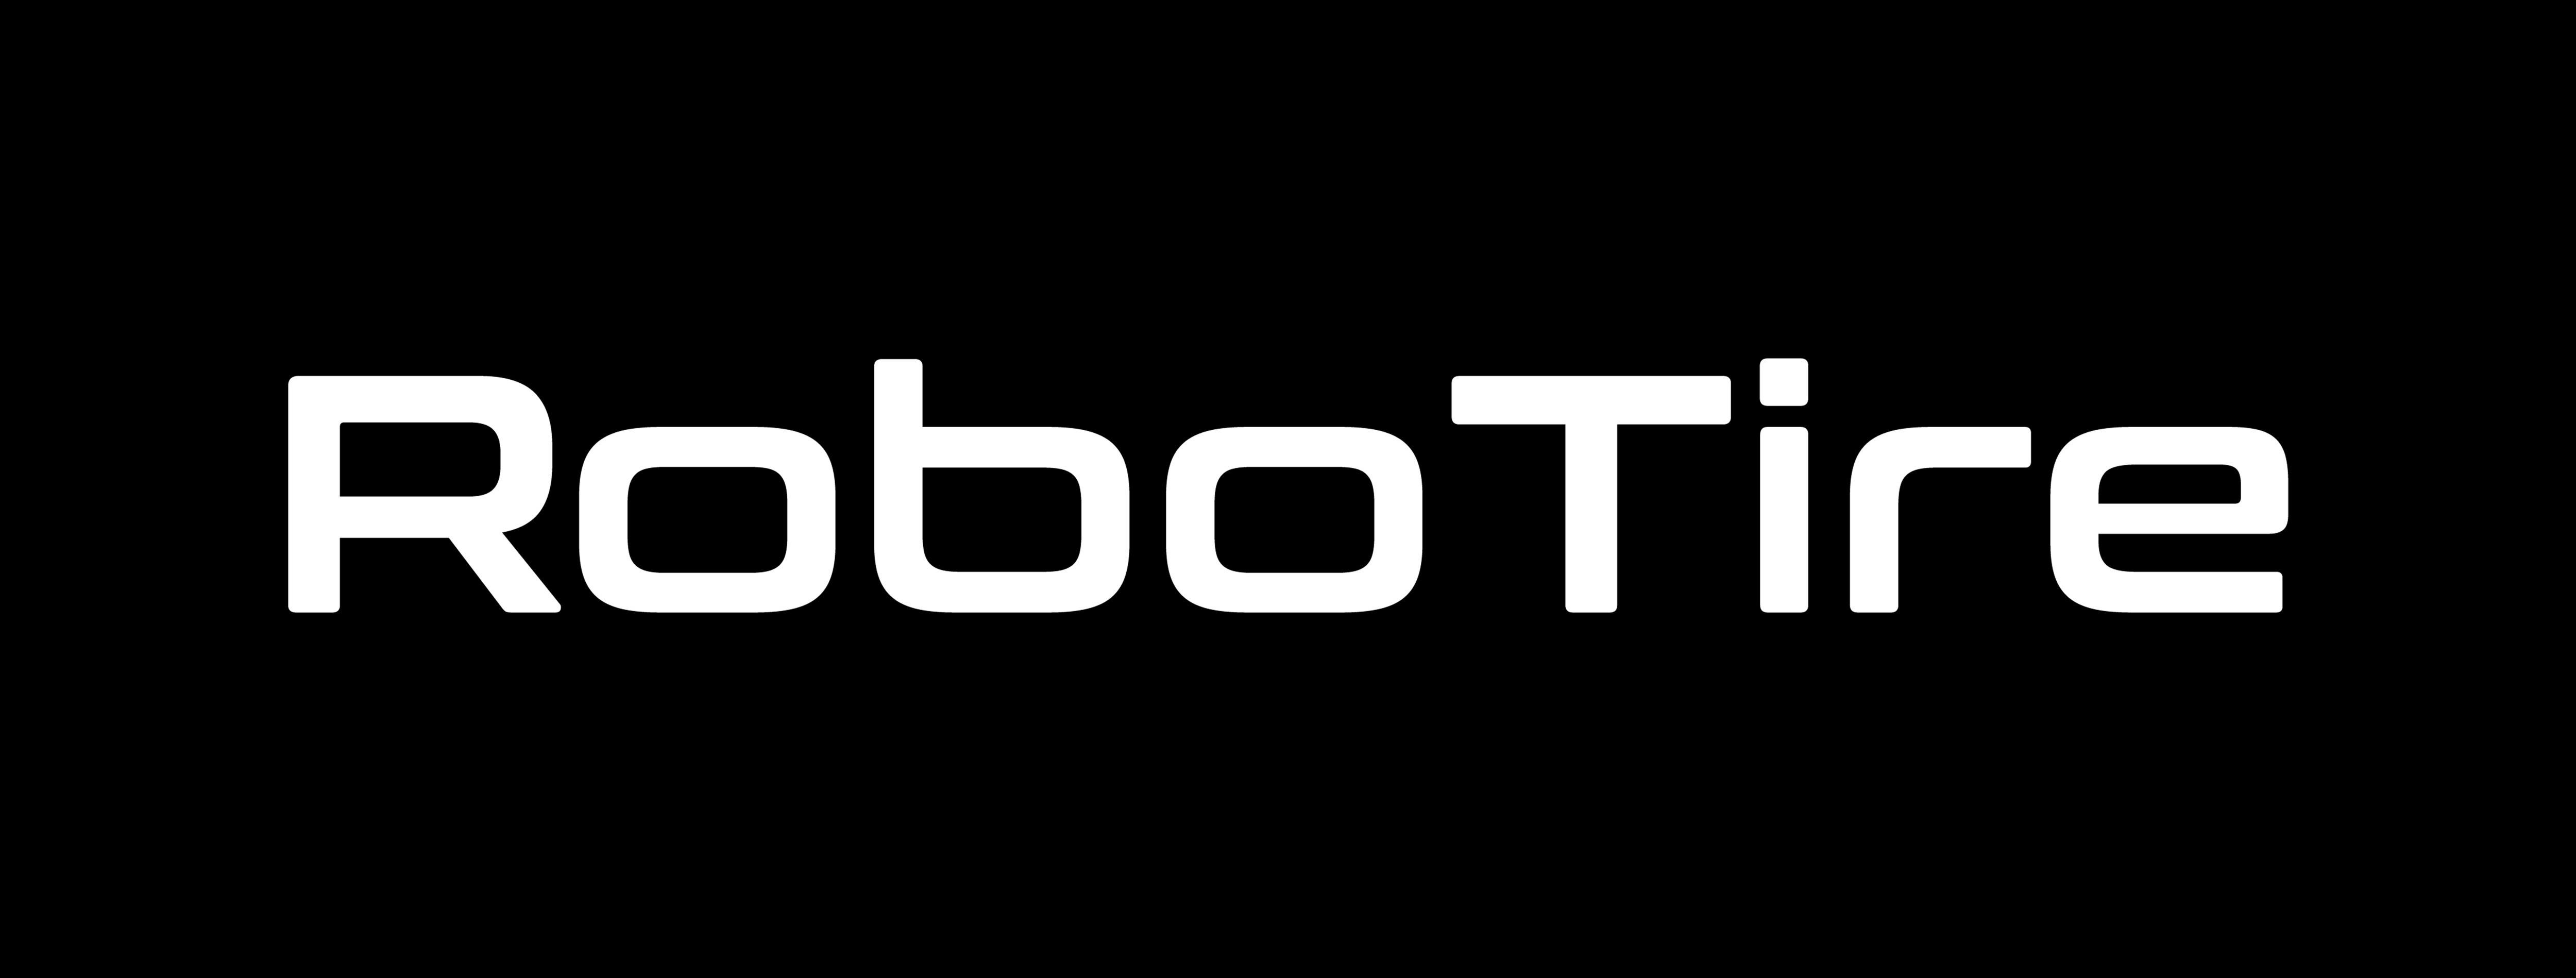 detroit-startup-funding-robotire